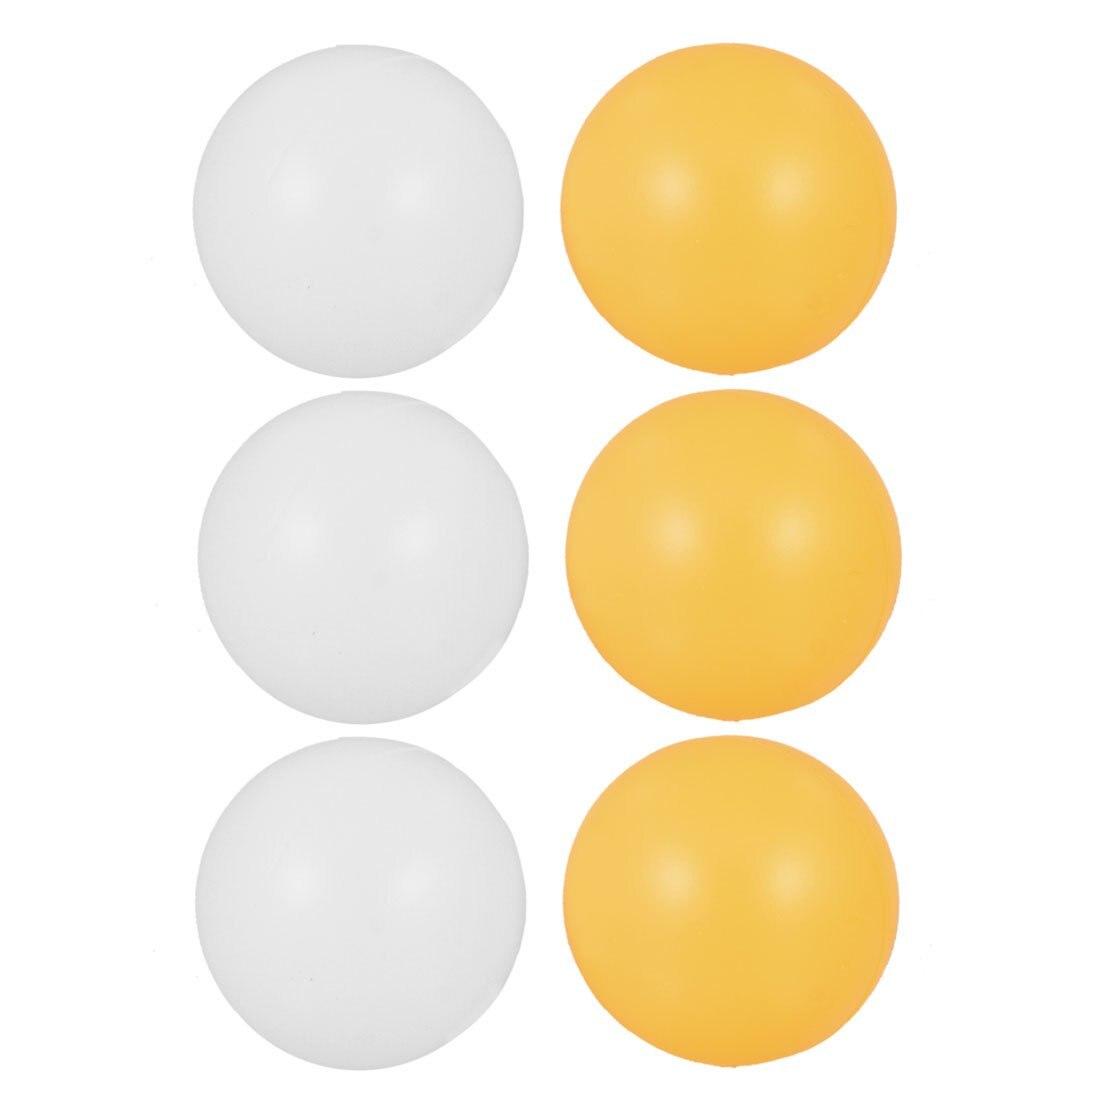 Good Deal White Orange 39mm Dia Sports Table Tennis Balls Ping Pong Ball 6 Pcs